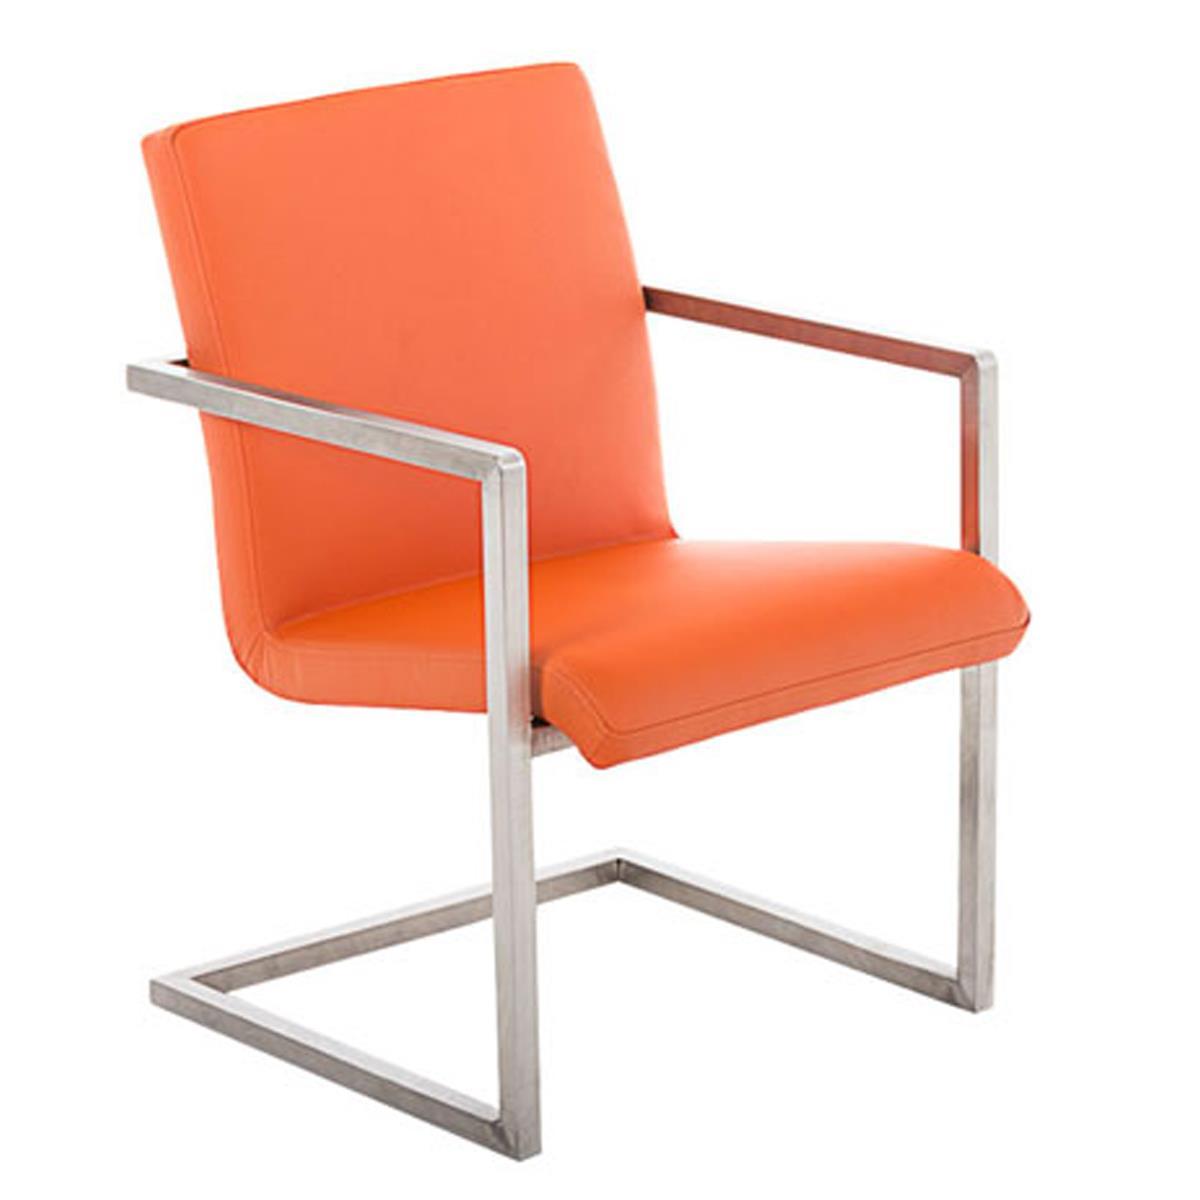 Sedia per sala d 39 attesa owen design fresco e moderno for Sedute da ufficio